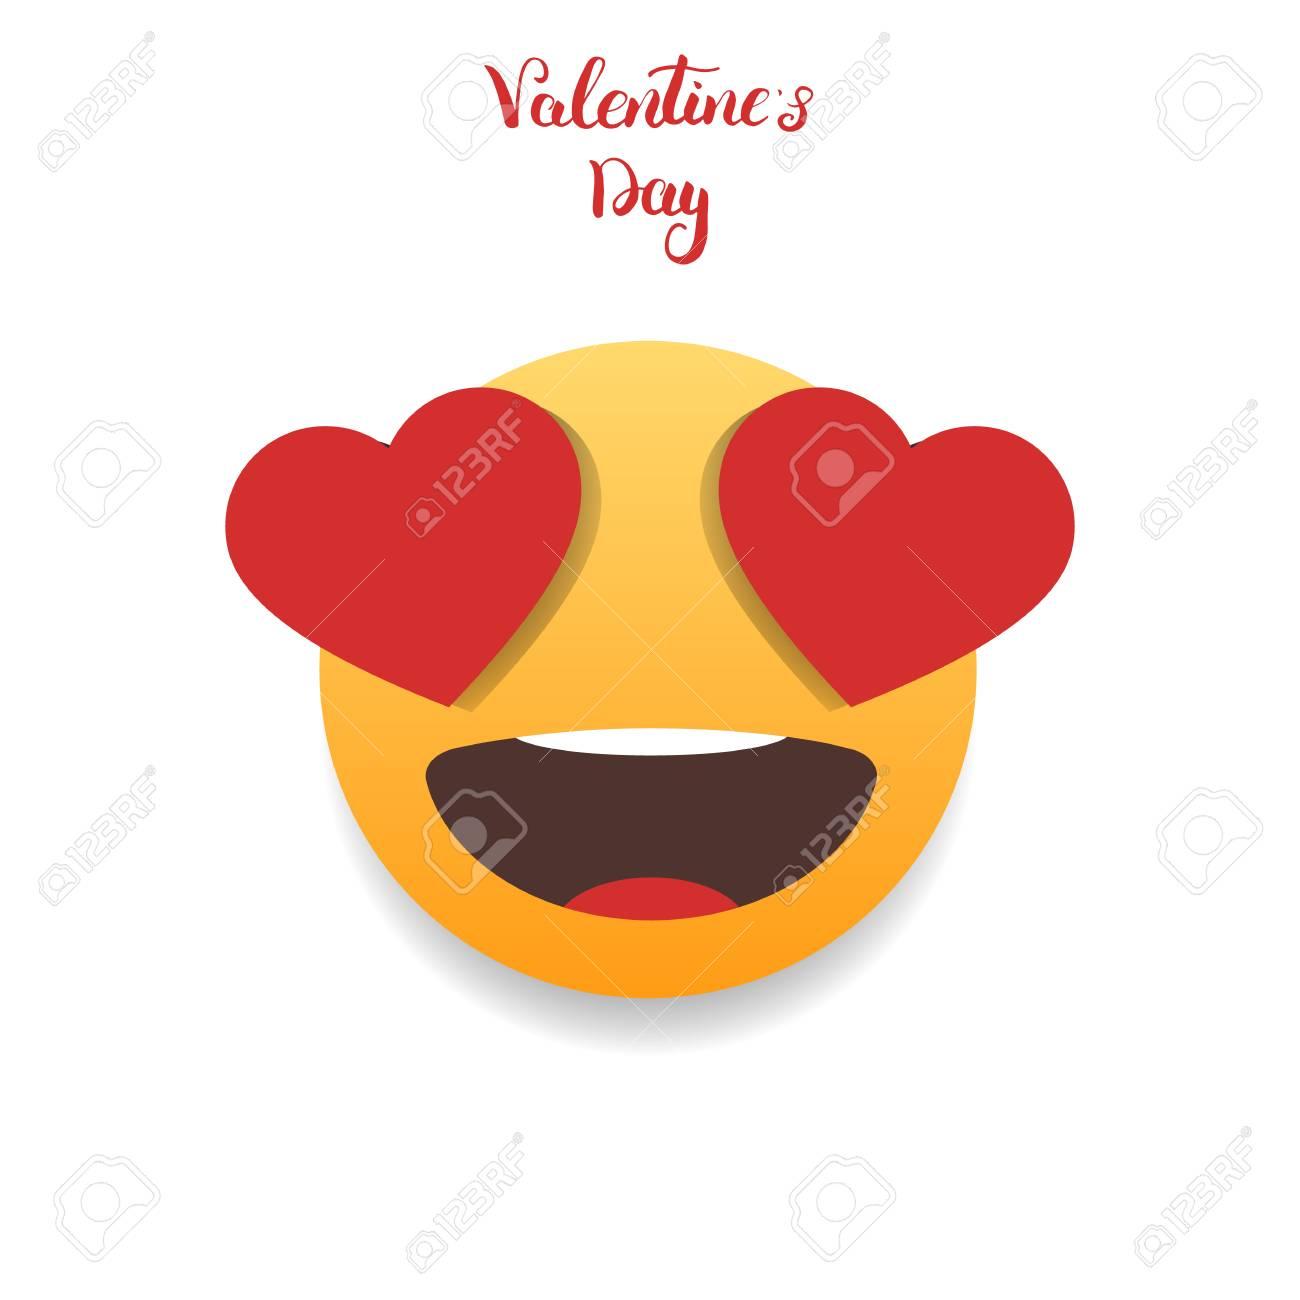 Valentines Day Emoticon In Love Emoji Stock Photo Picture And